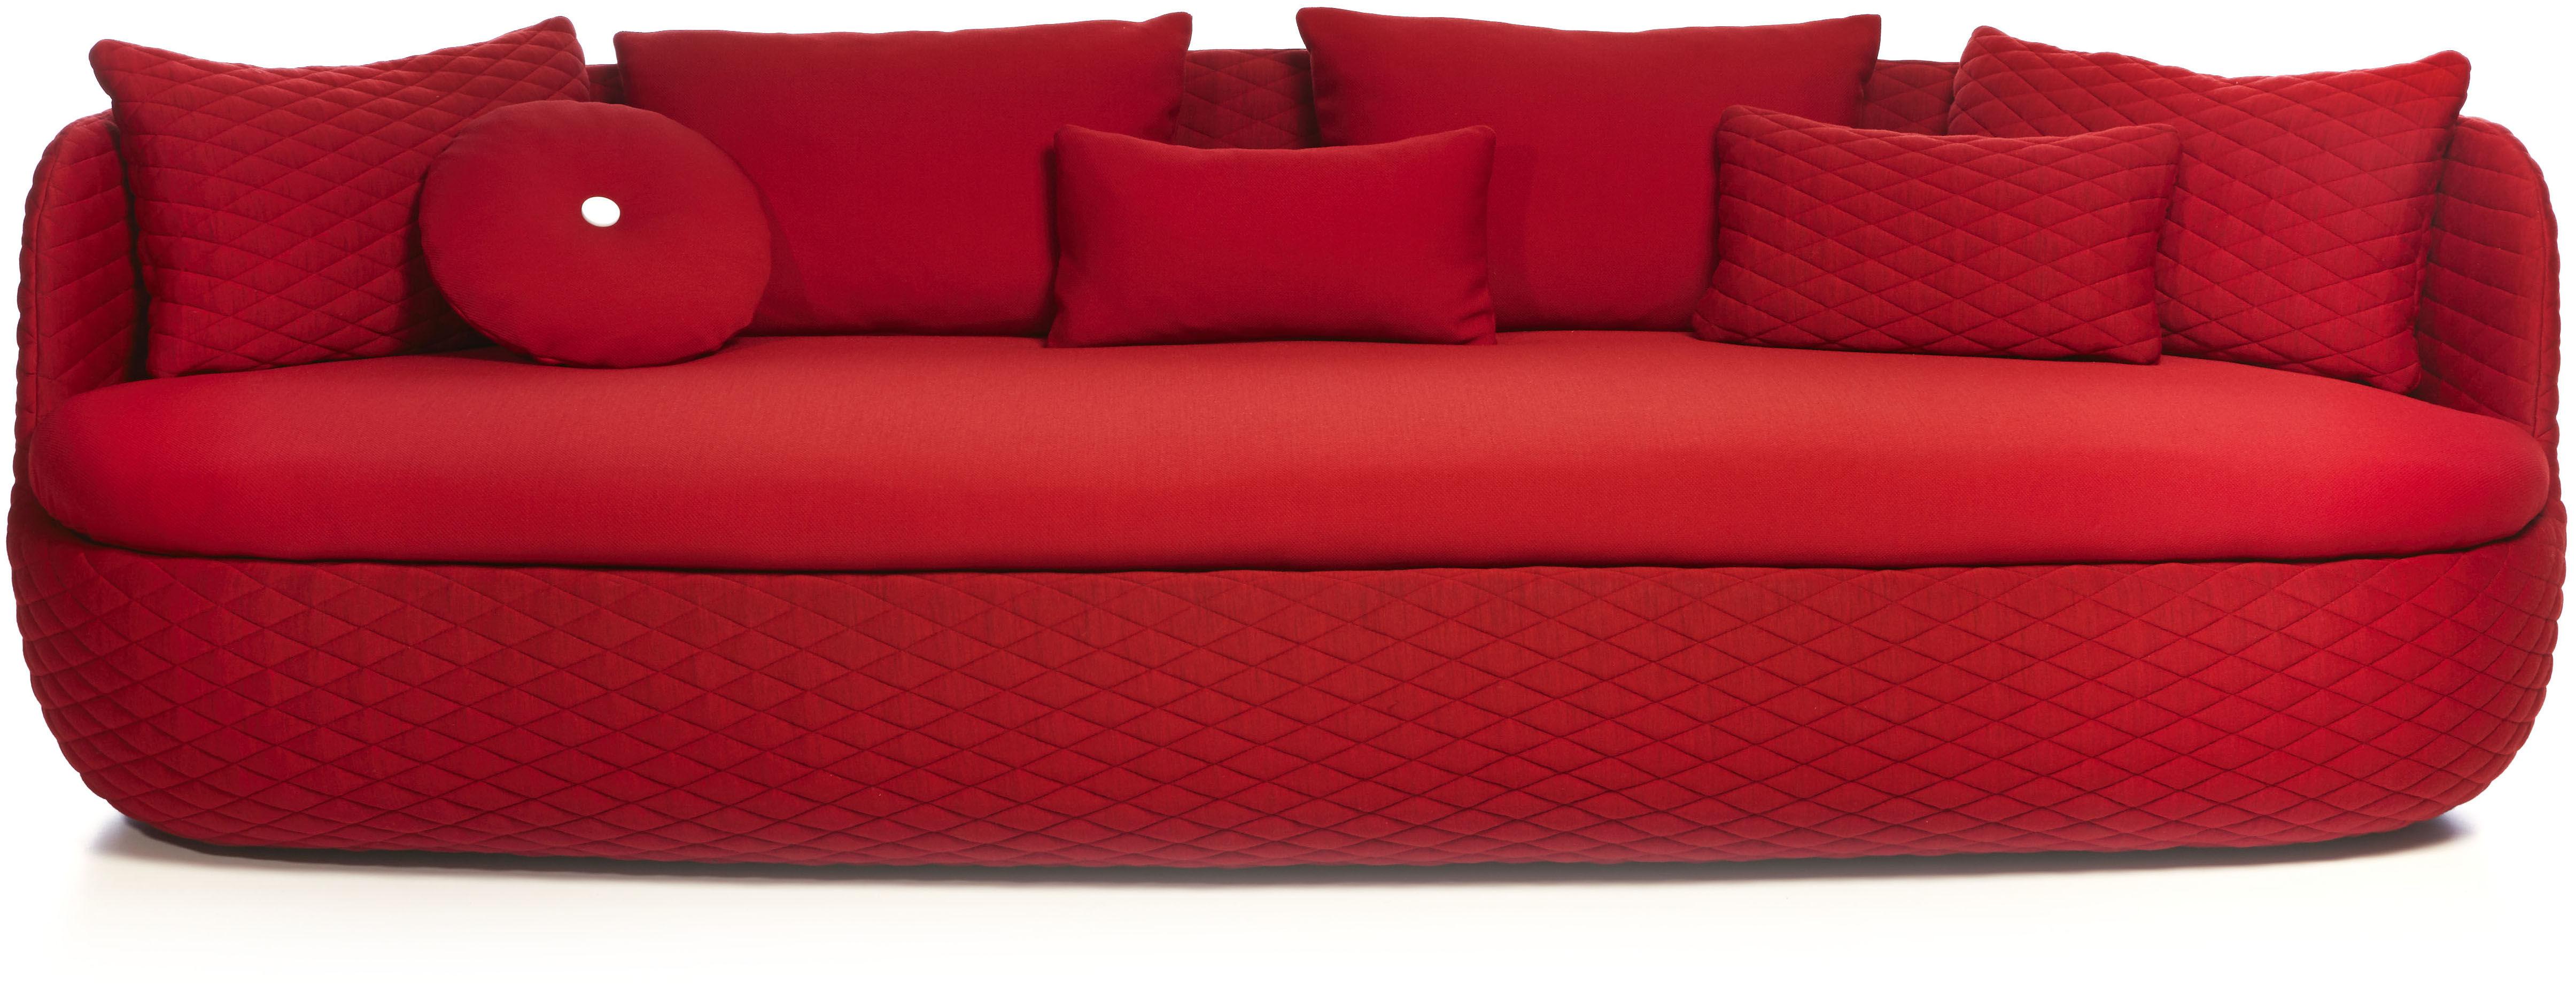 canap droit bart l 235 cm assise profonde tissu. Black Bedroom Furniture Sets. Home Design Ideas